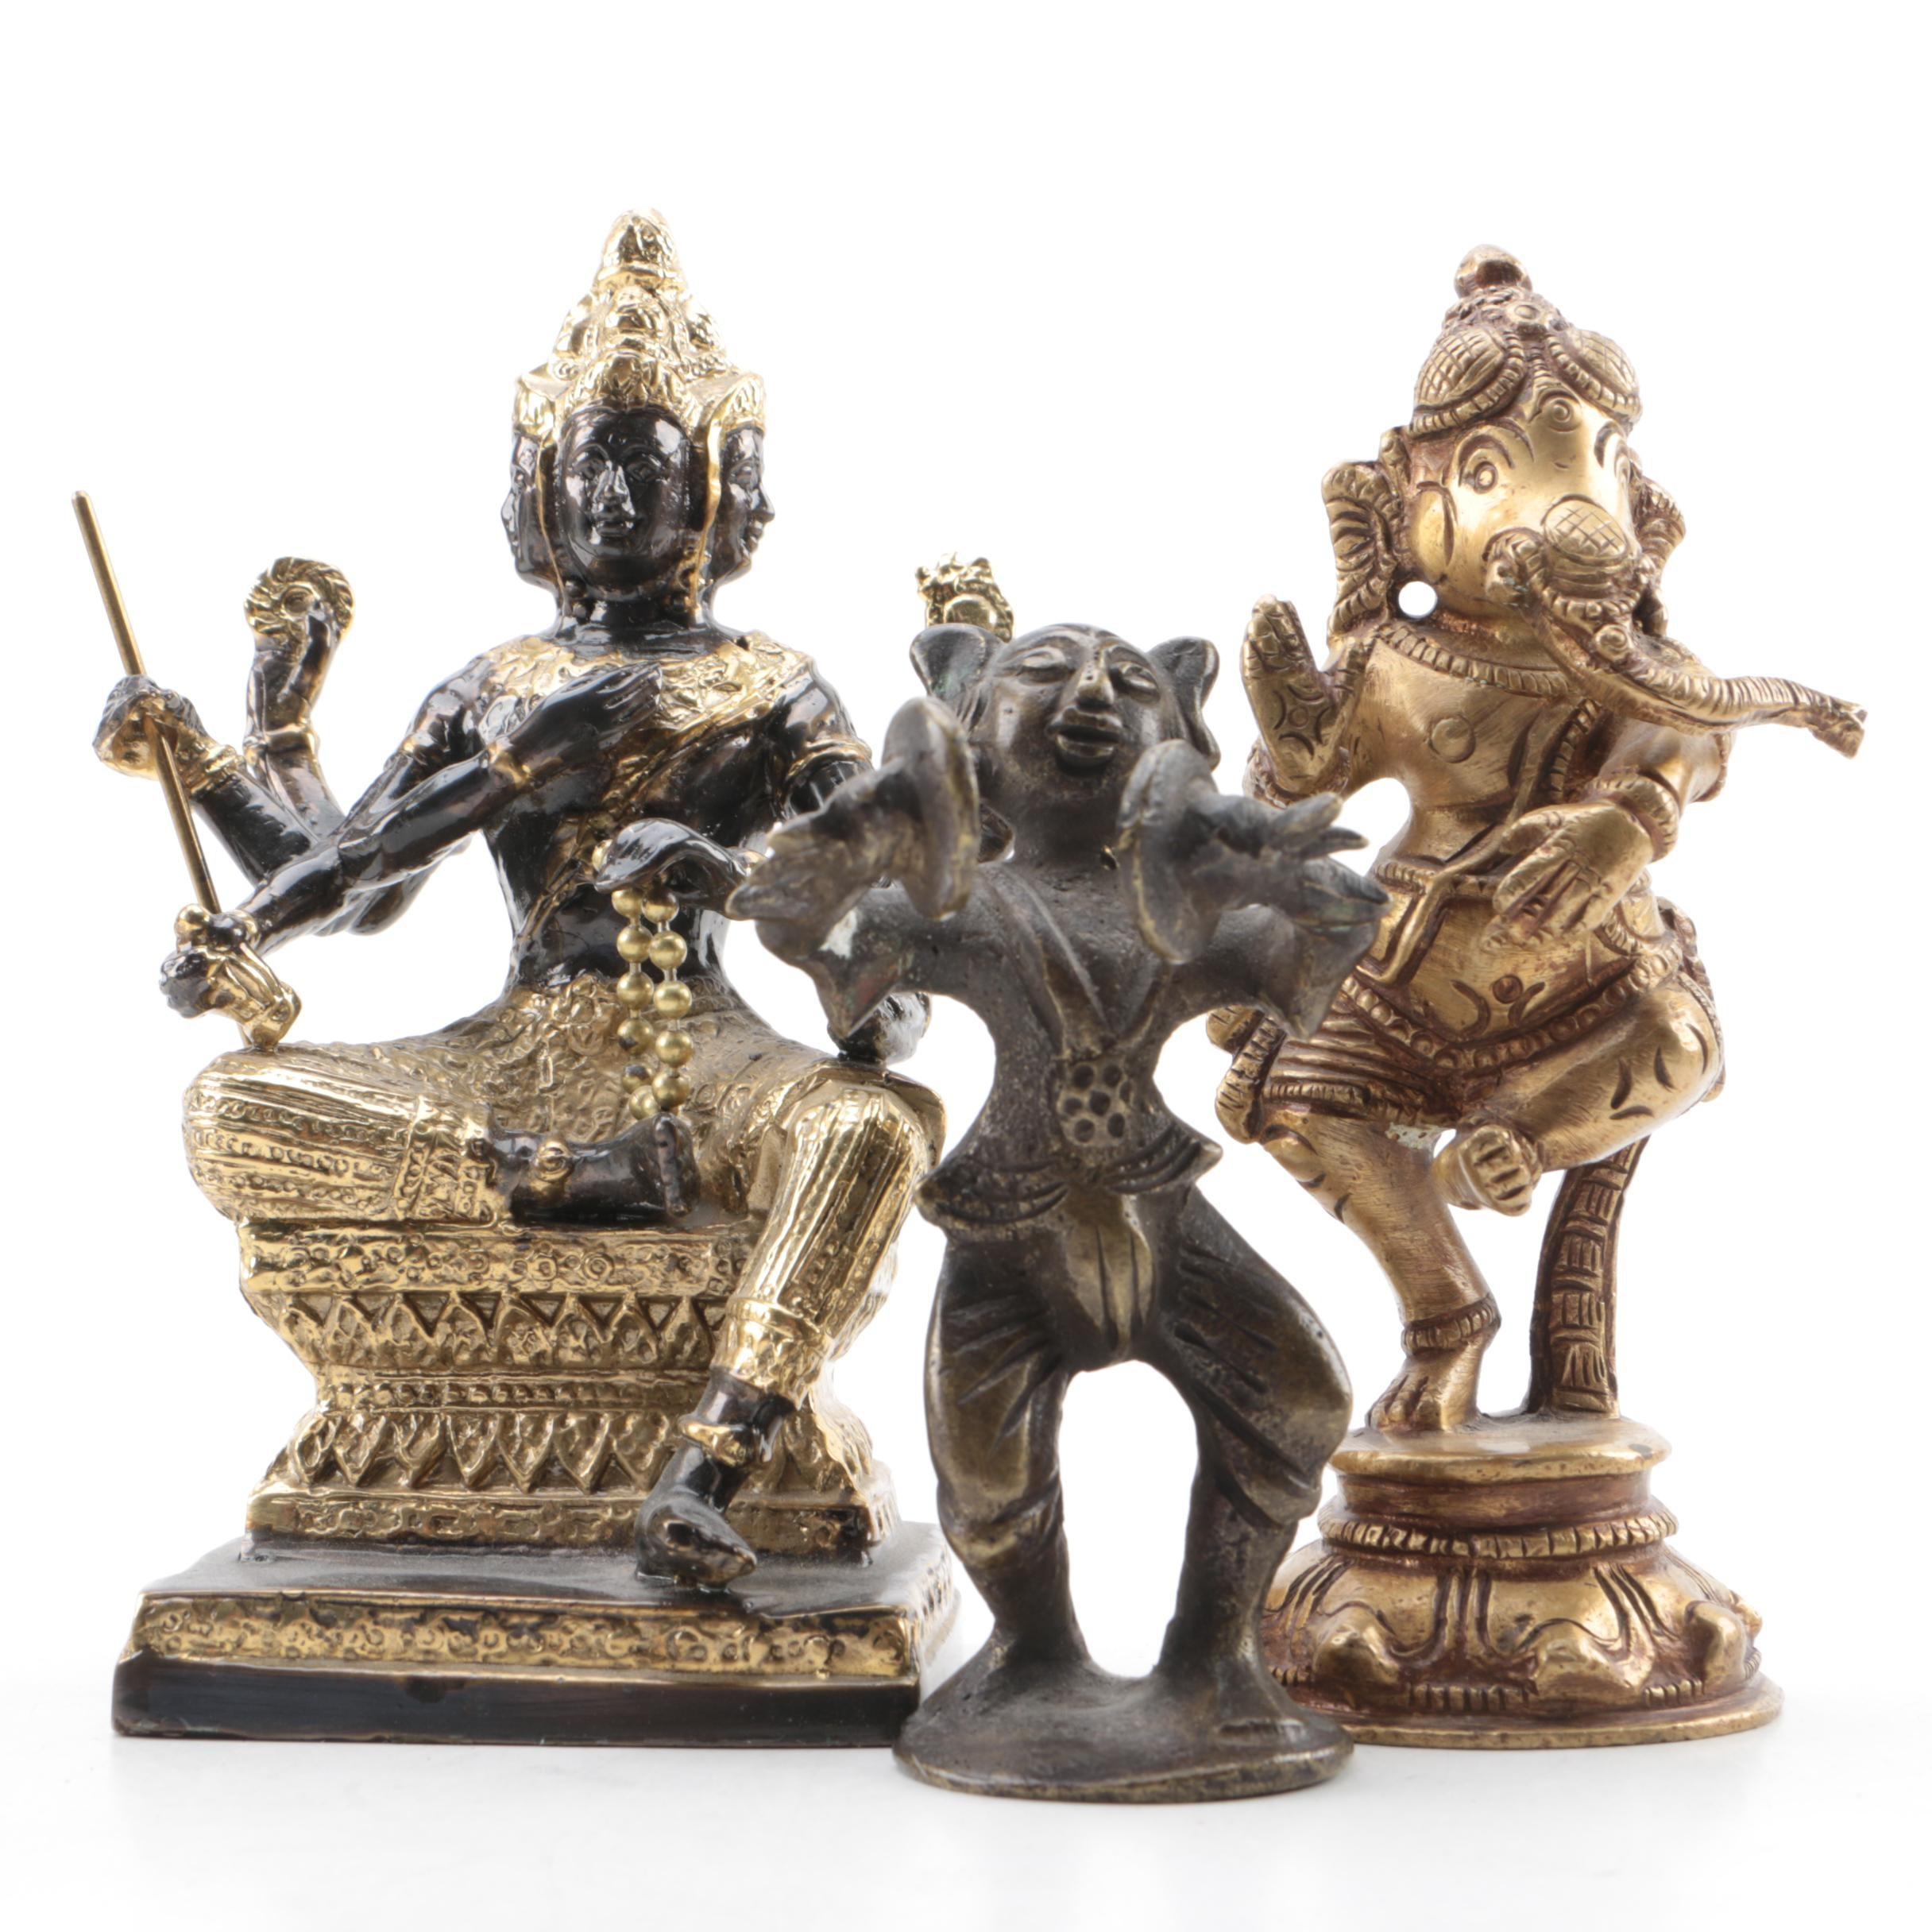 Bronze Tone Metal Figurines Featuring Ganesha